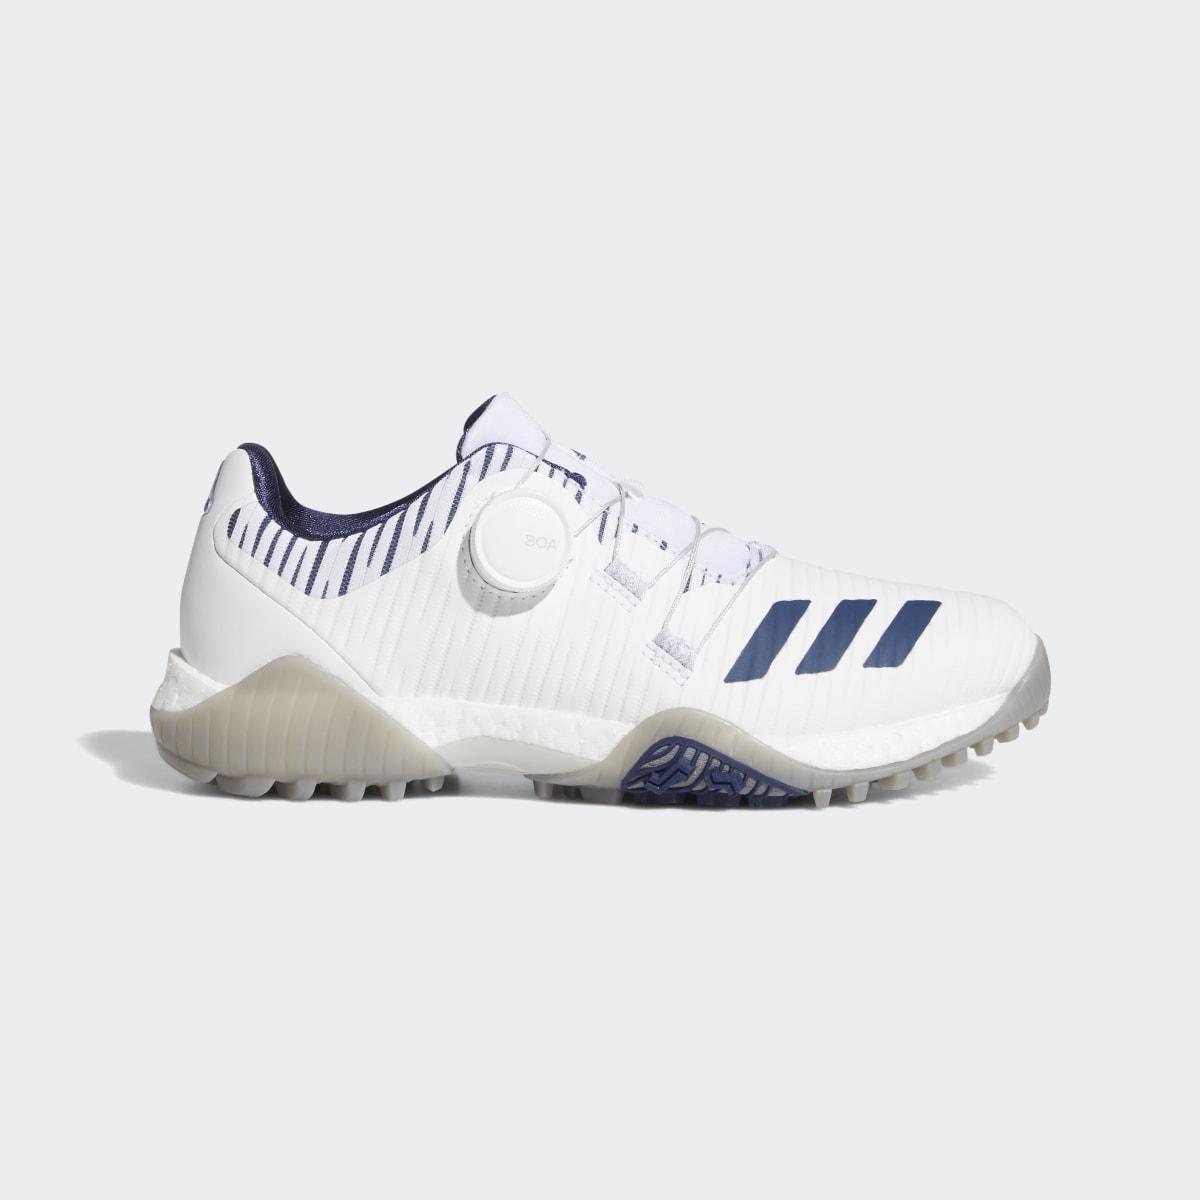 CodeChaos Boa Golf Shoes